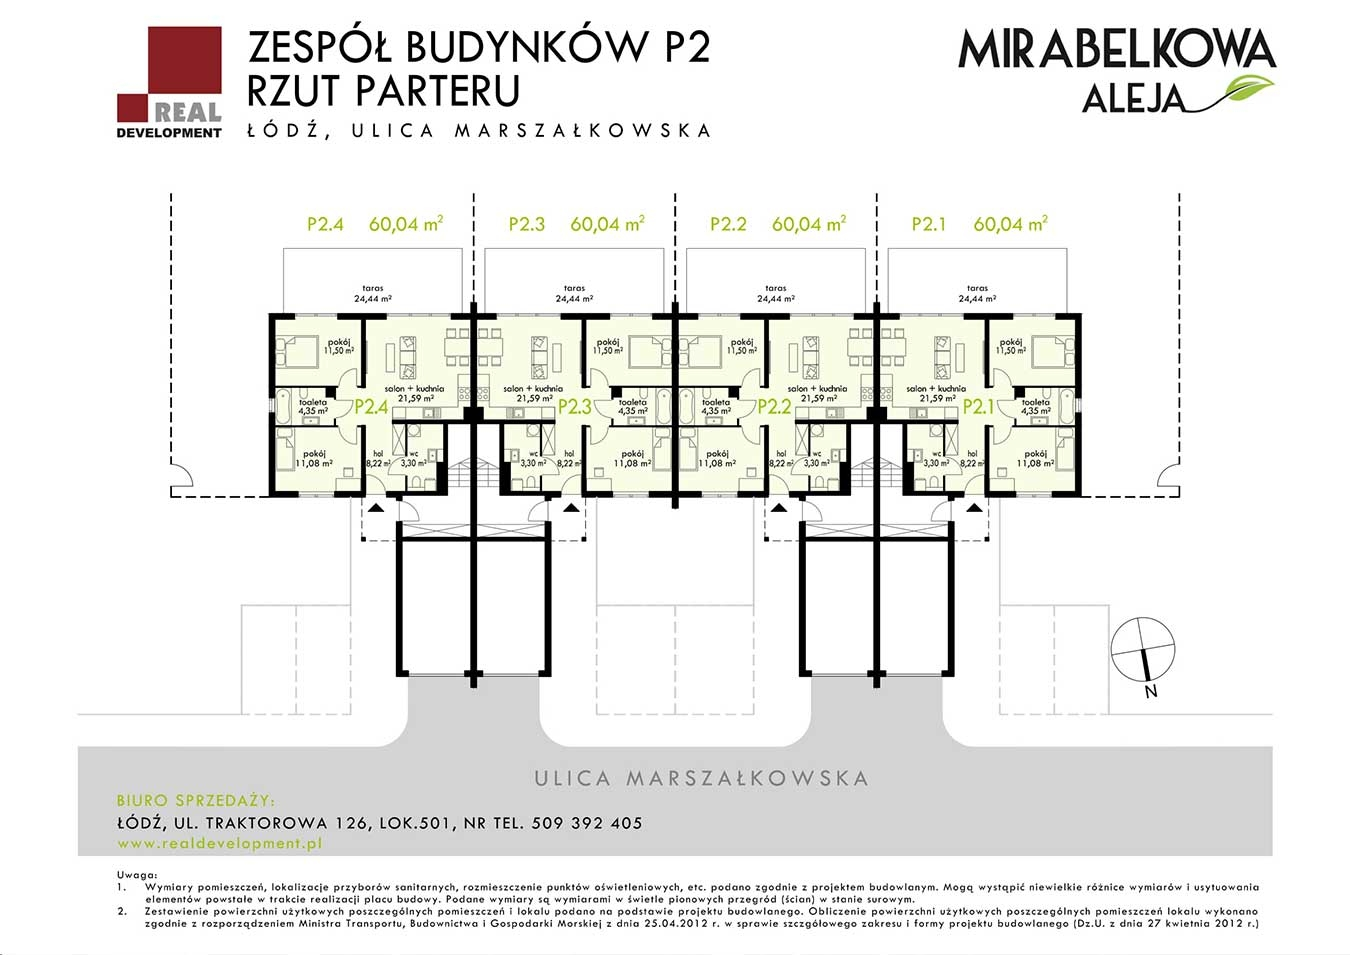 Mirabelkowa Aleja PP - Parter P2